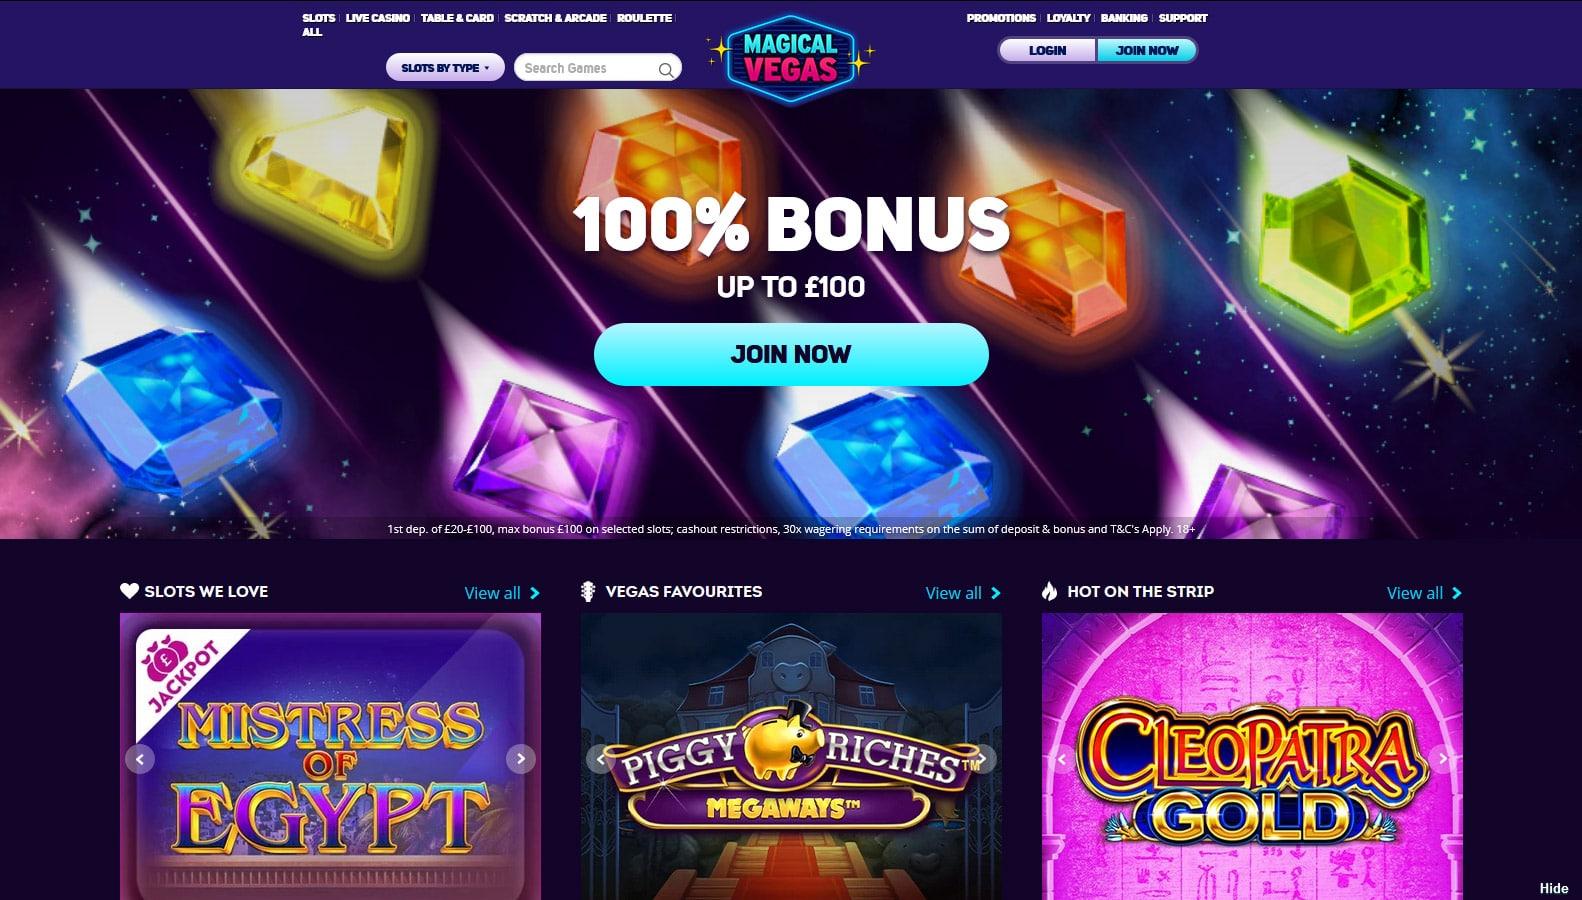 Magical Vegas online